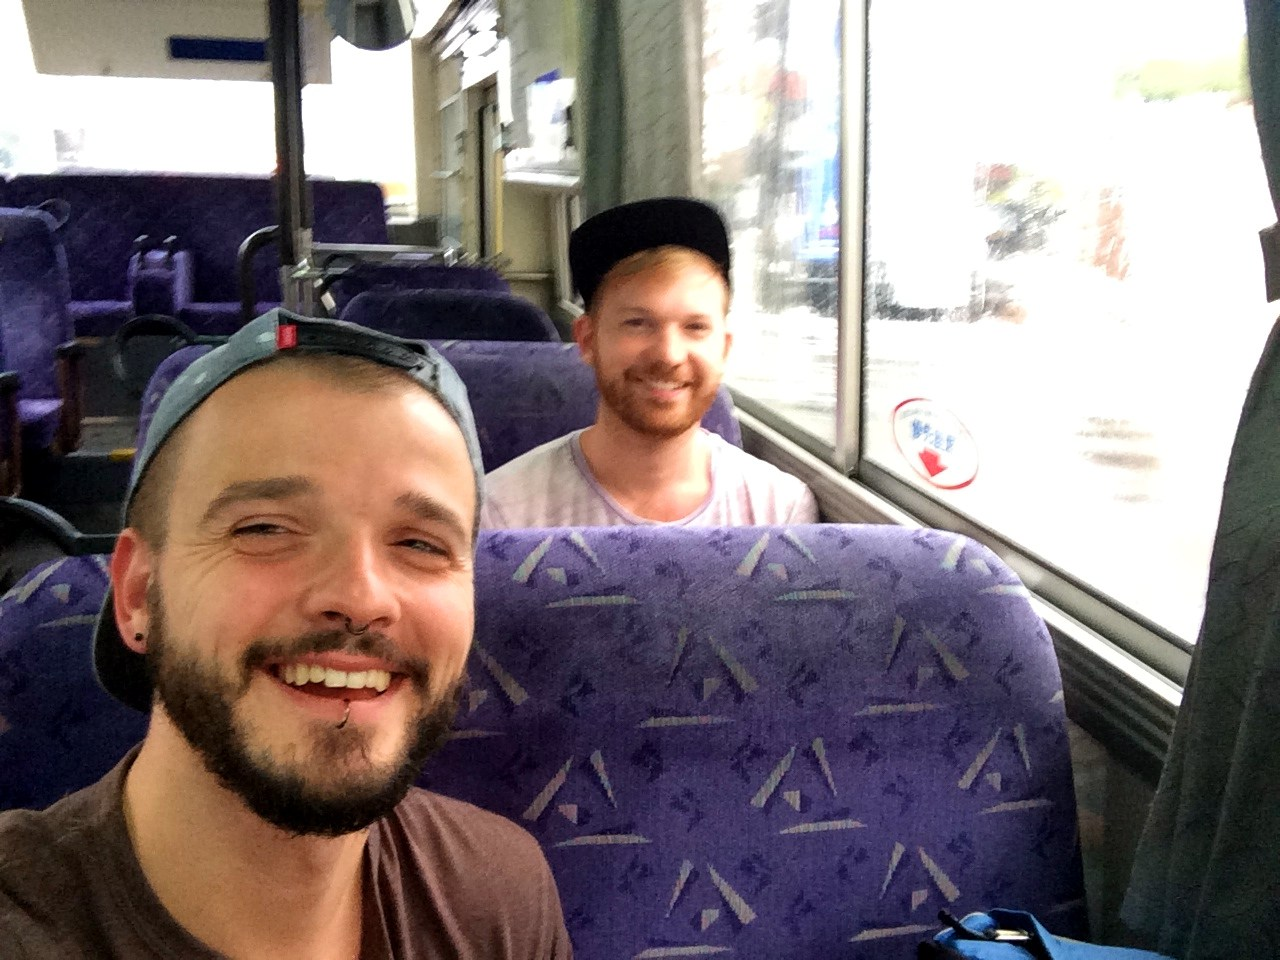 Selfie in the Bus to Takijiri-Oji to start our pilgrimage © CoupleofMen.com